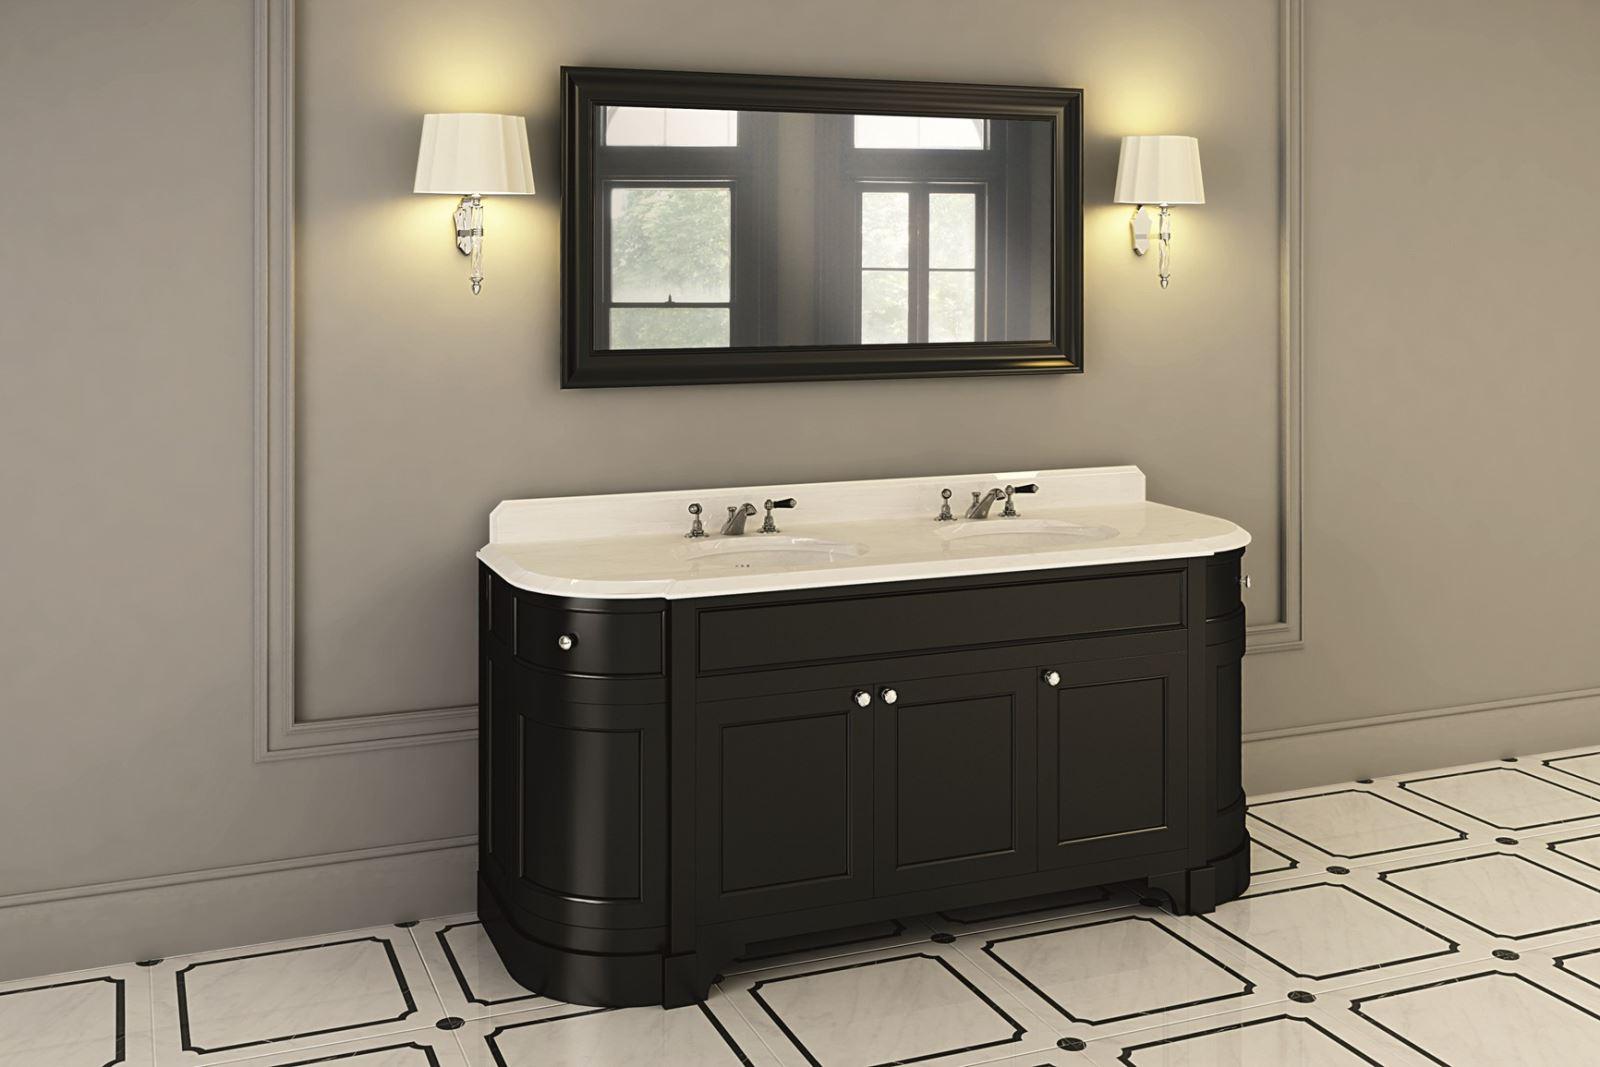 Vendita mobili per bagno in veneto : vendita online mobili bagno ...